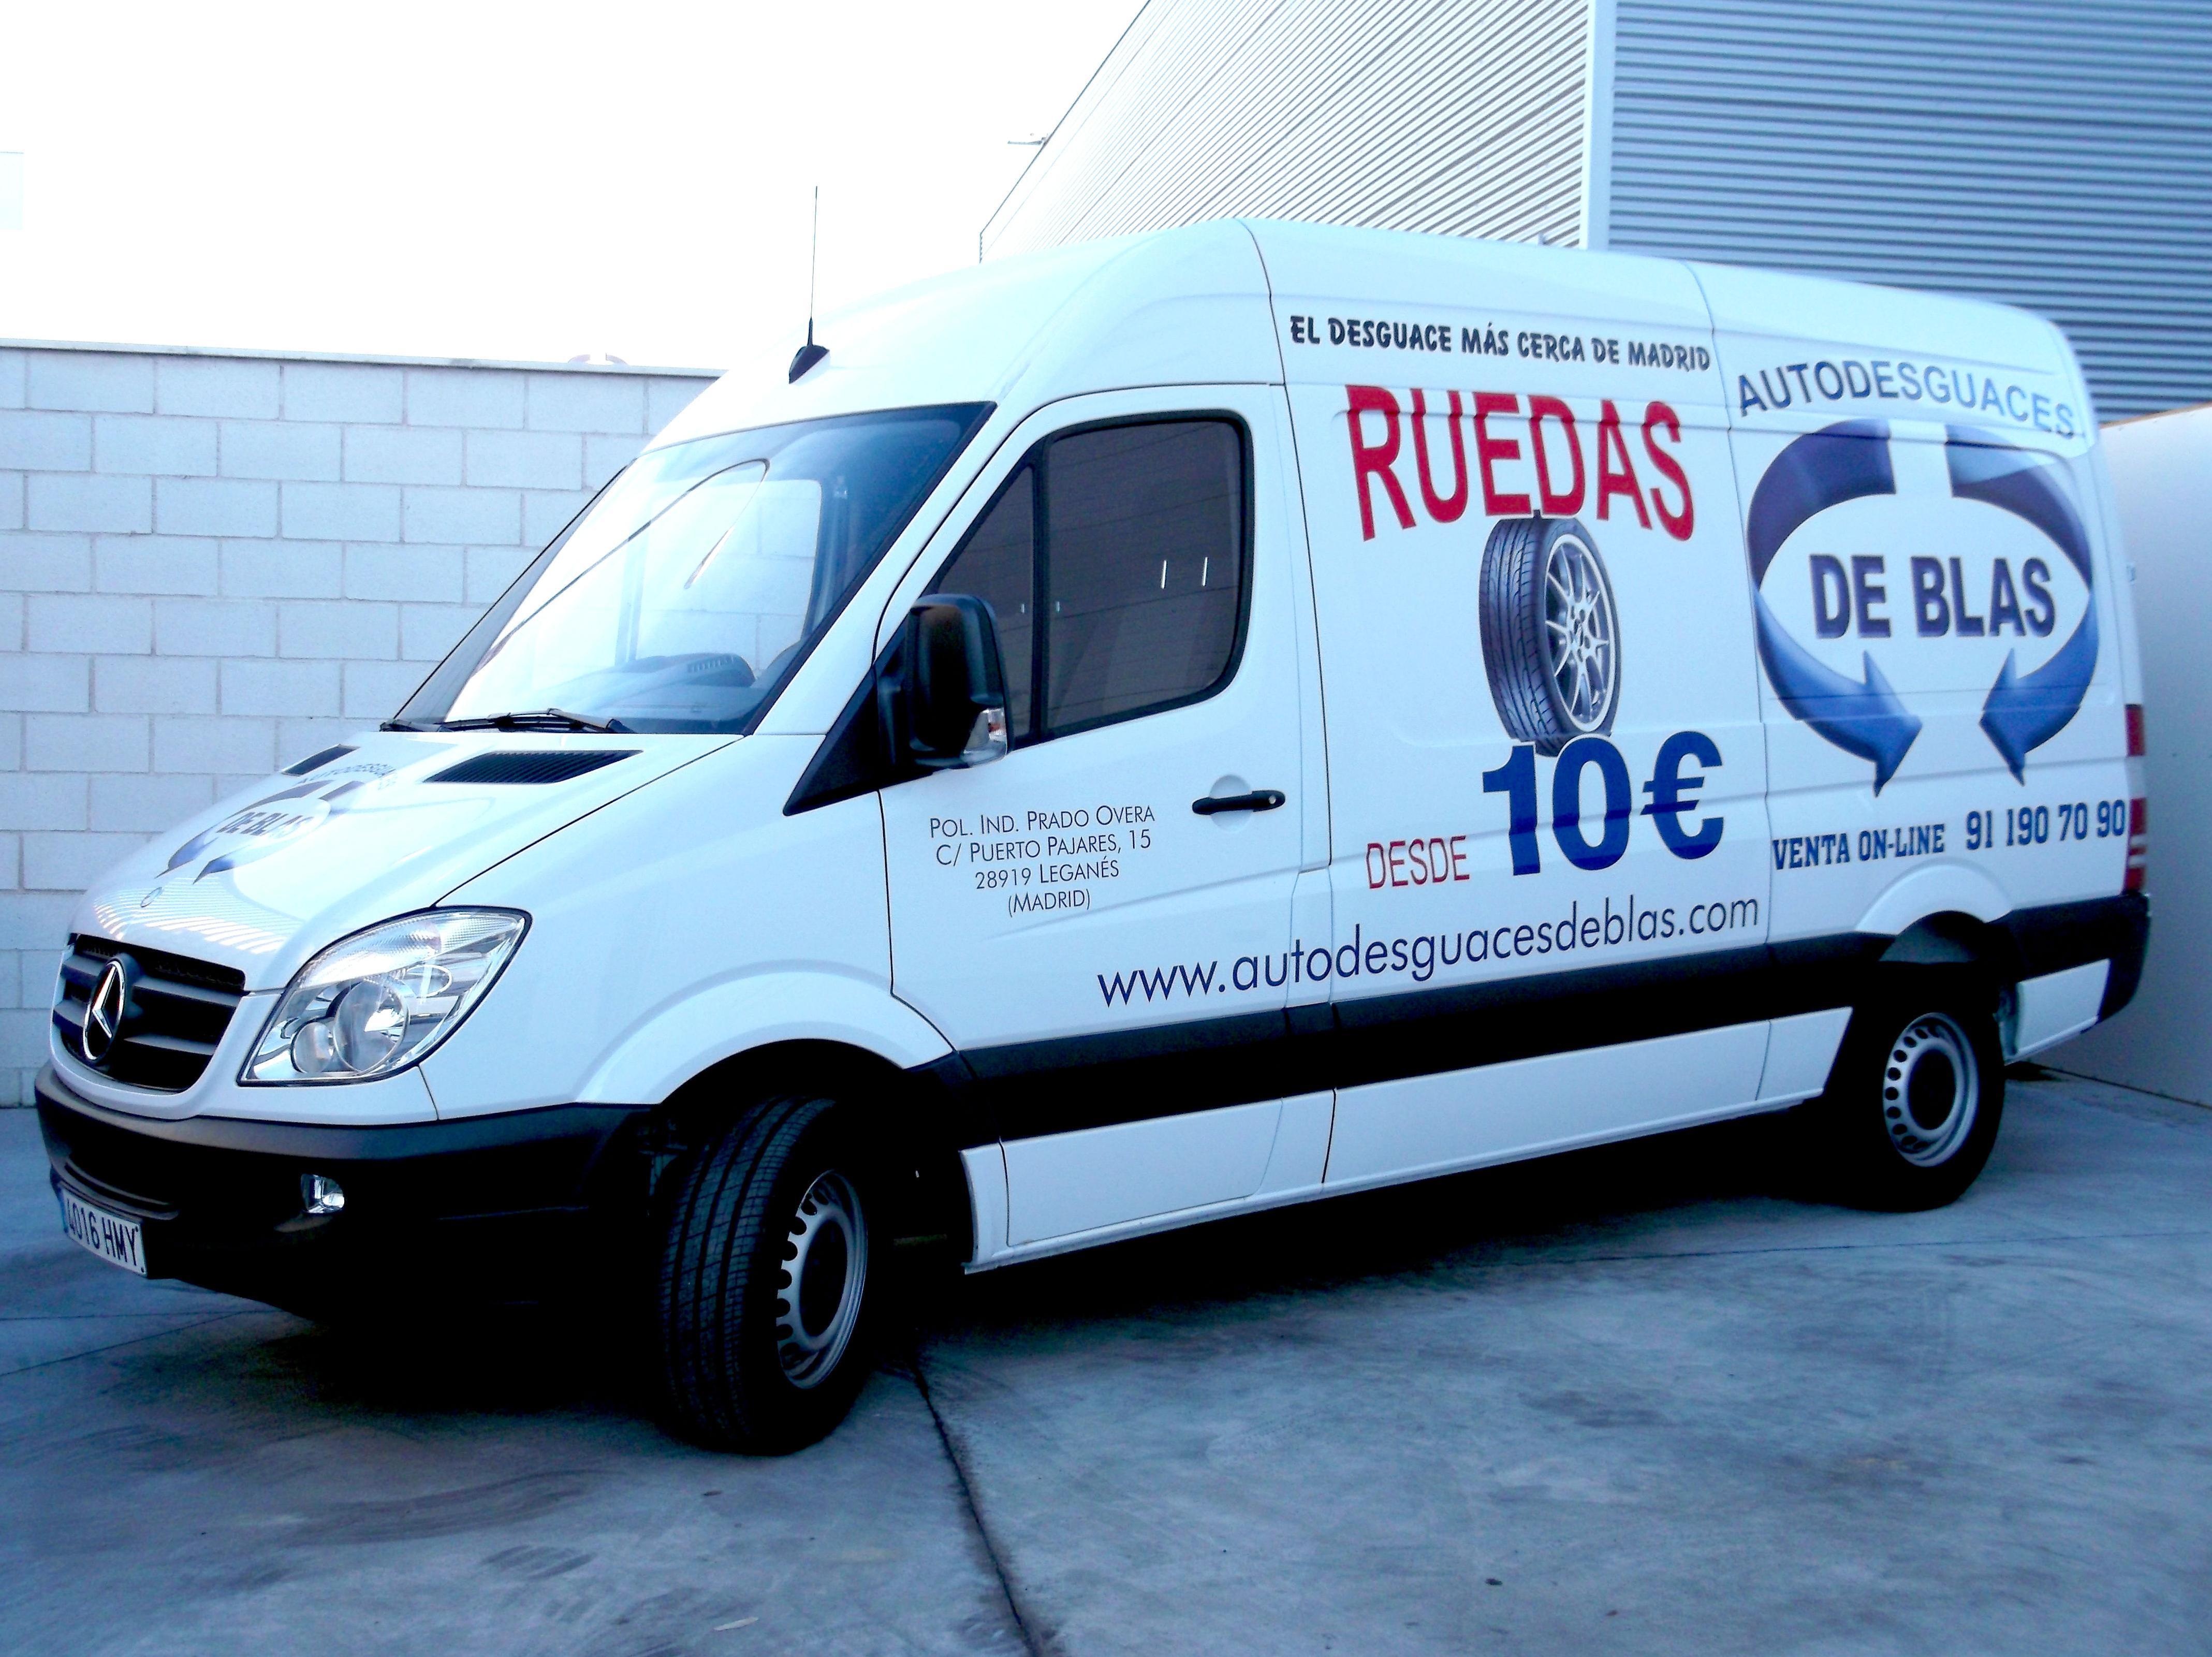 Foto 20 de Desguaces y chatarras en Leganés | Autodesguaces De Blas